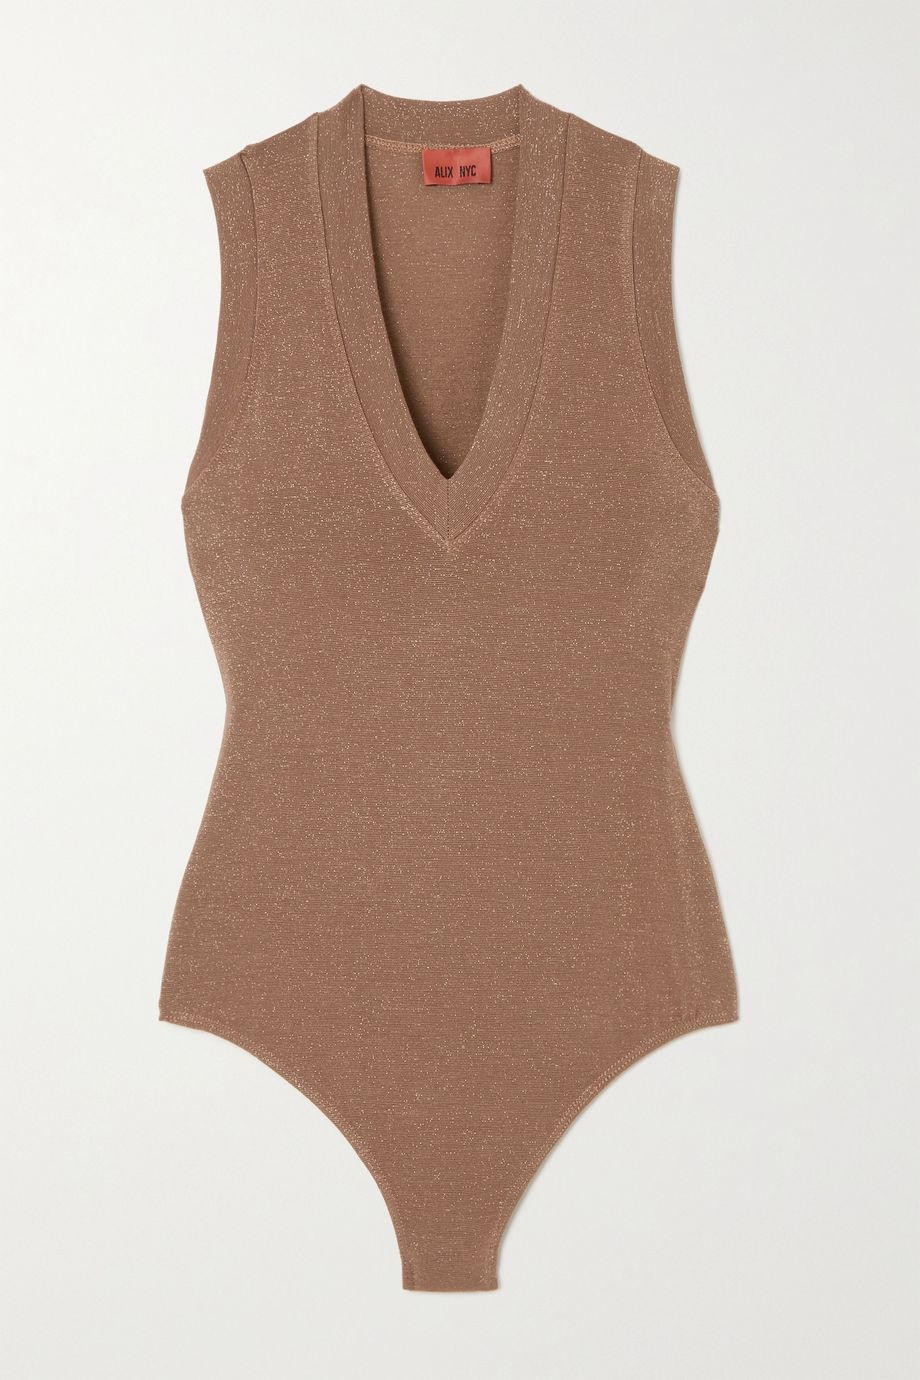 Alix NYC Merit metallic stretch-jersey bodysuit